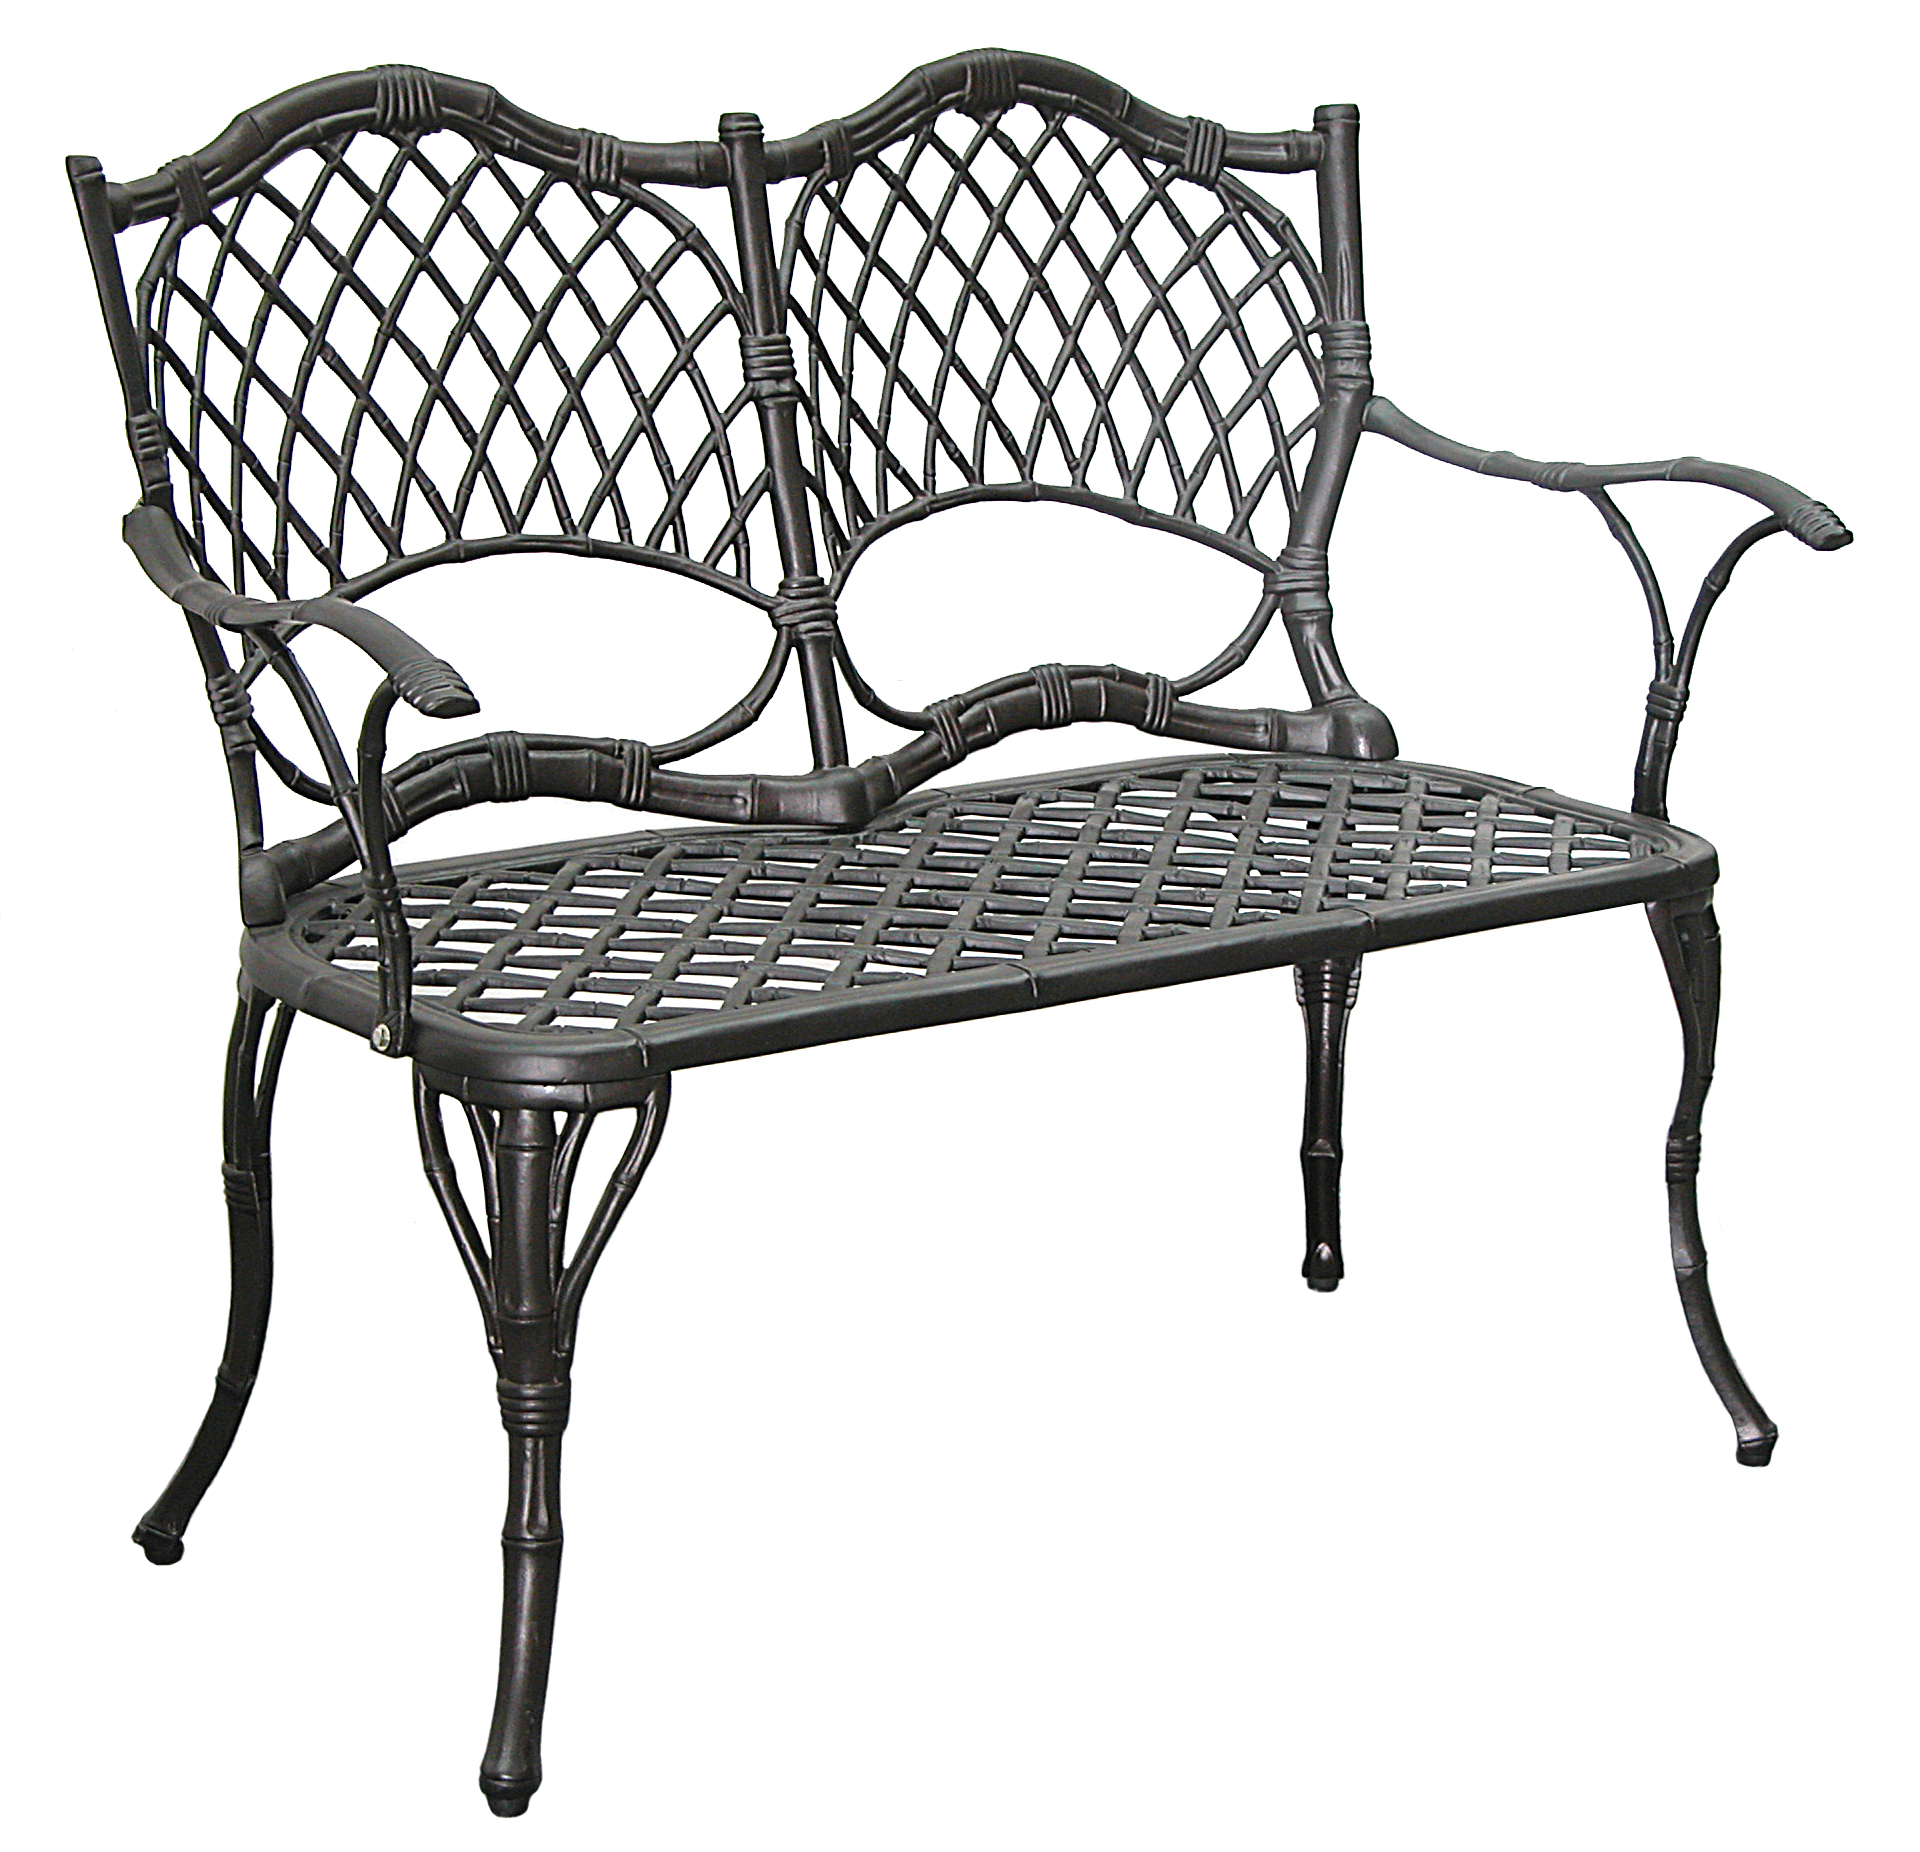 Patio Furniture Bench Cast Aluminum Iron Loveseat Black Bamboo